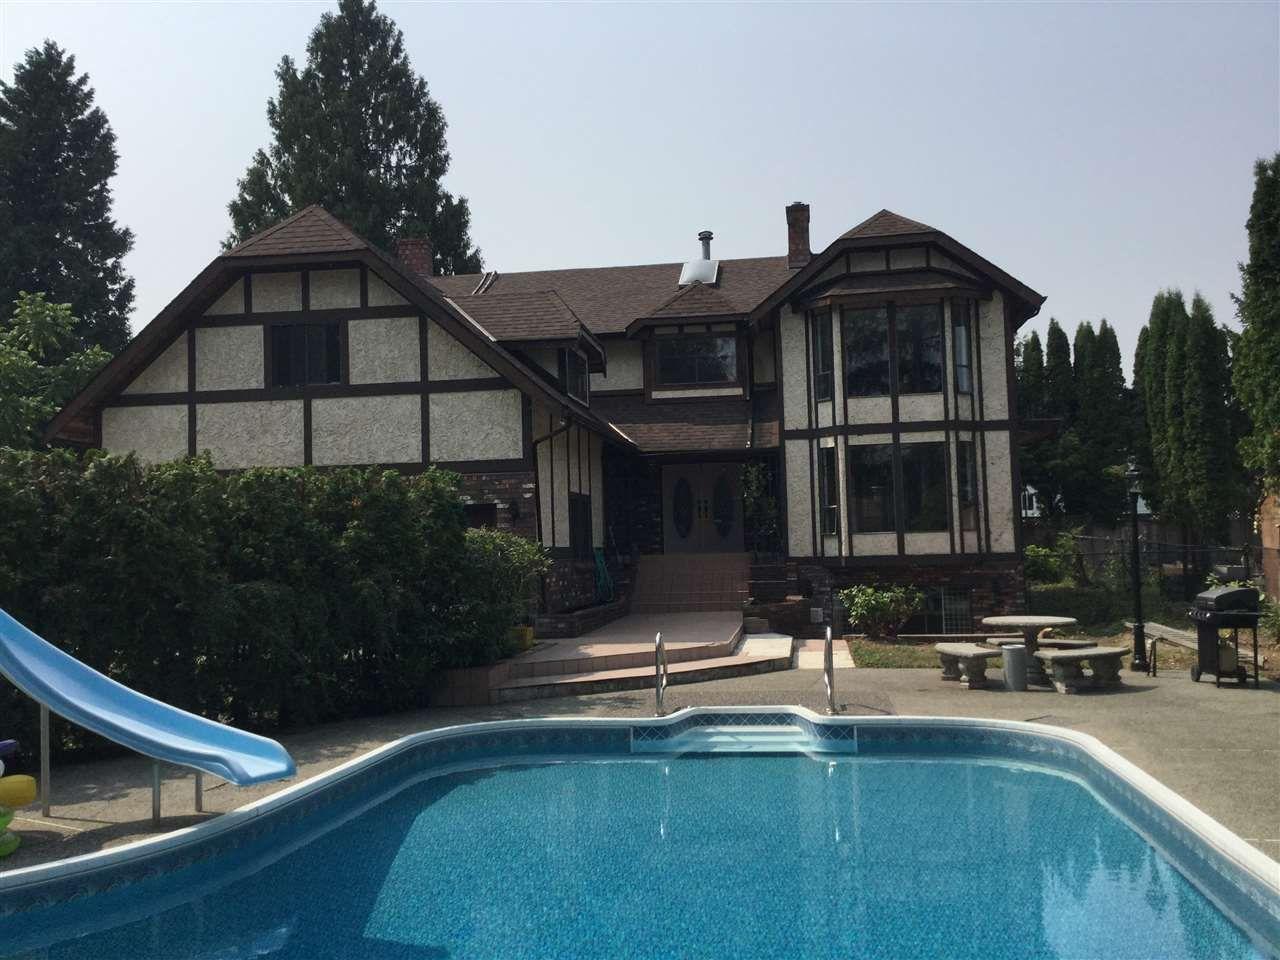 Main Photo: 22178 124TH Avenue in Maple Ridge: Northwest Maple Ridge House for sale : MLS®# R2195495